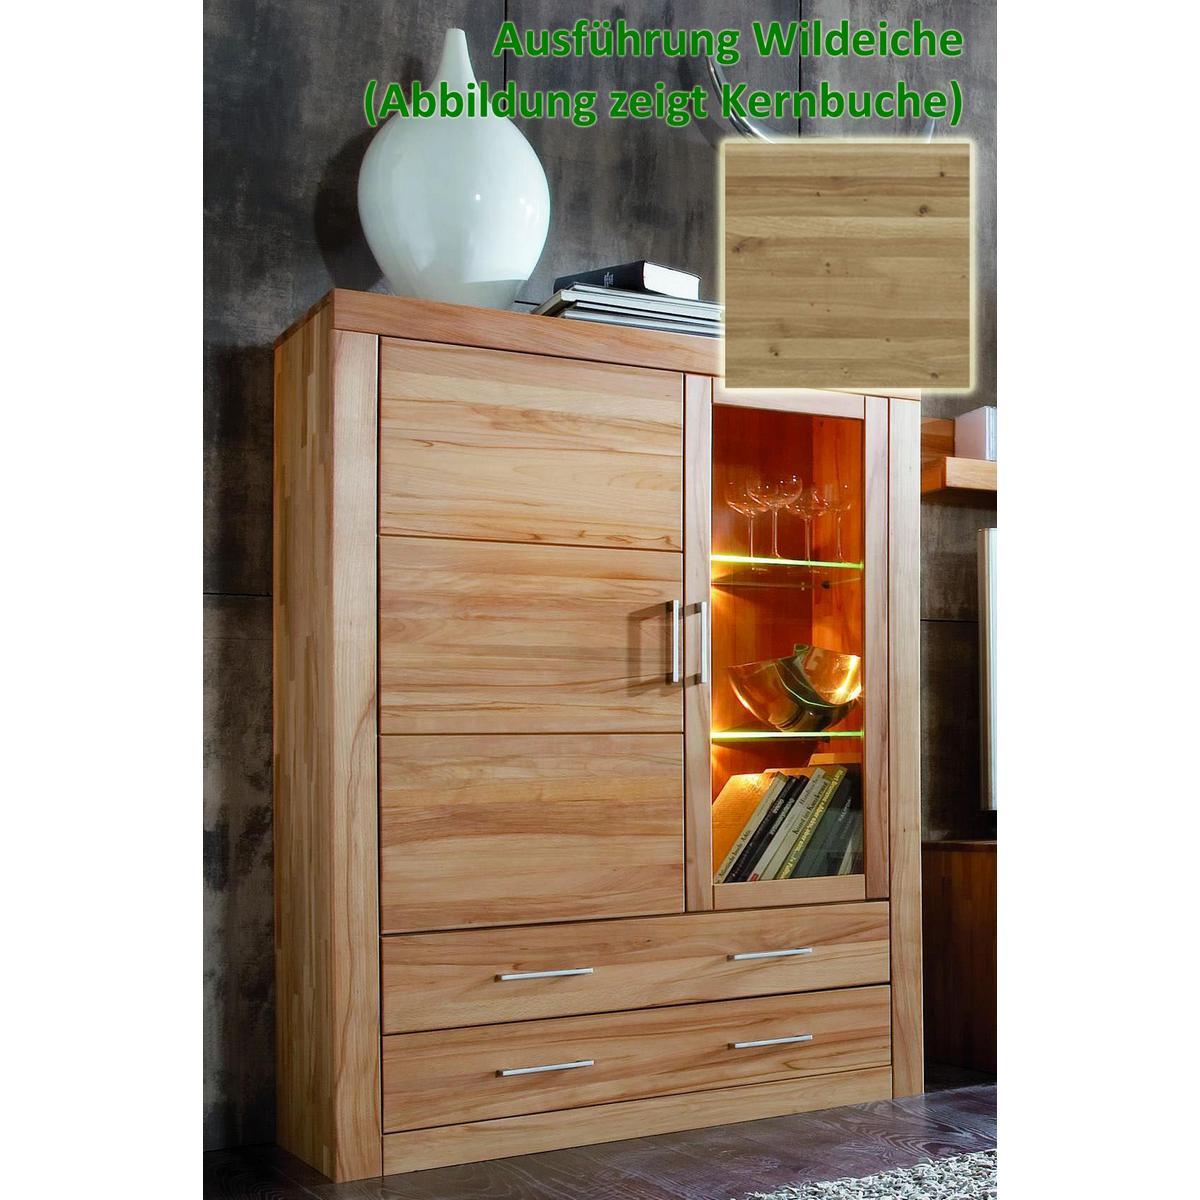 vitrinenschrank holz wildeiche eiche massiv ge lt iia jale. Black Bedroom Furniture Sets. Home Design Ideas